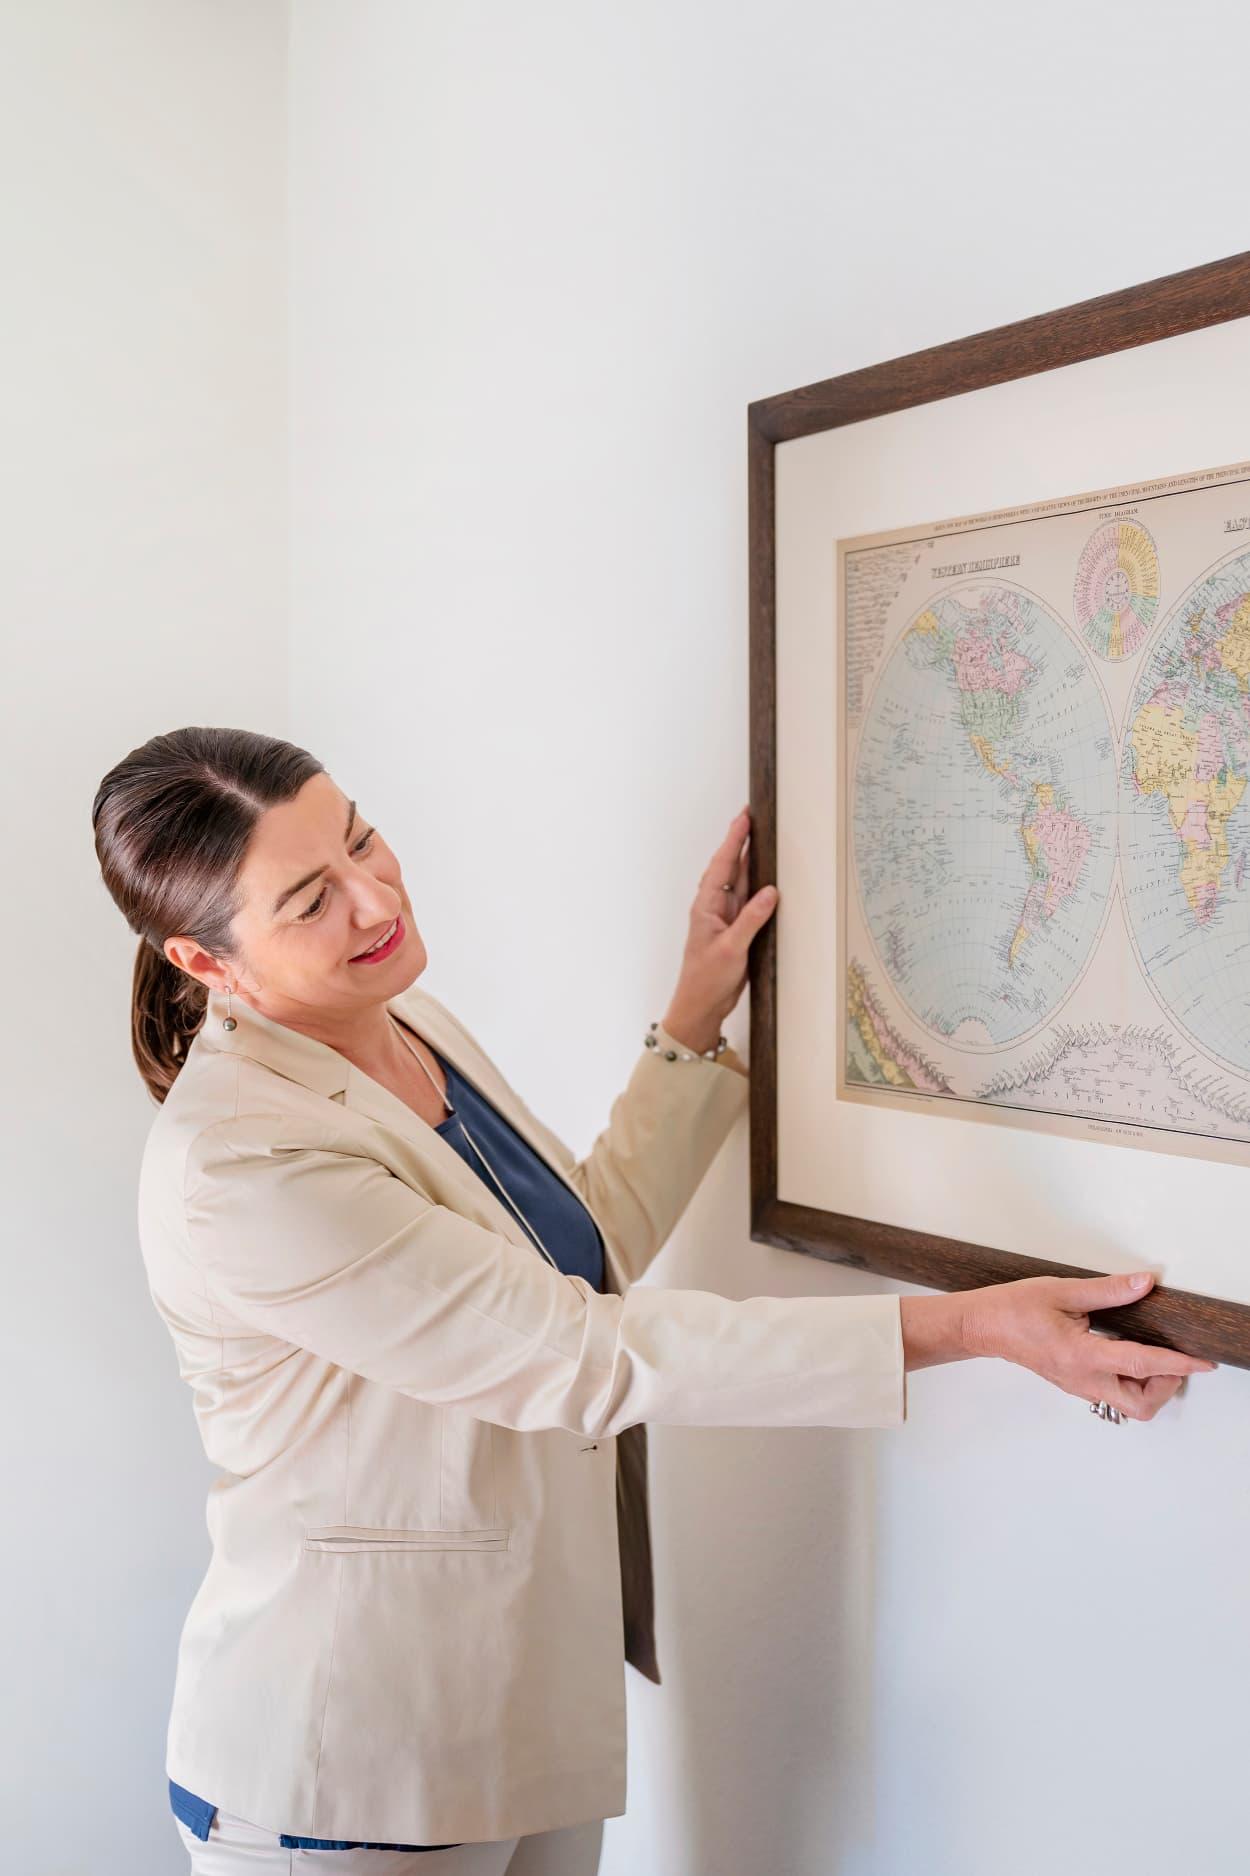 Simone adjusting a framed world map